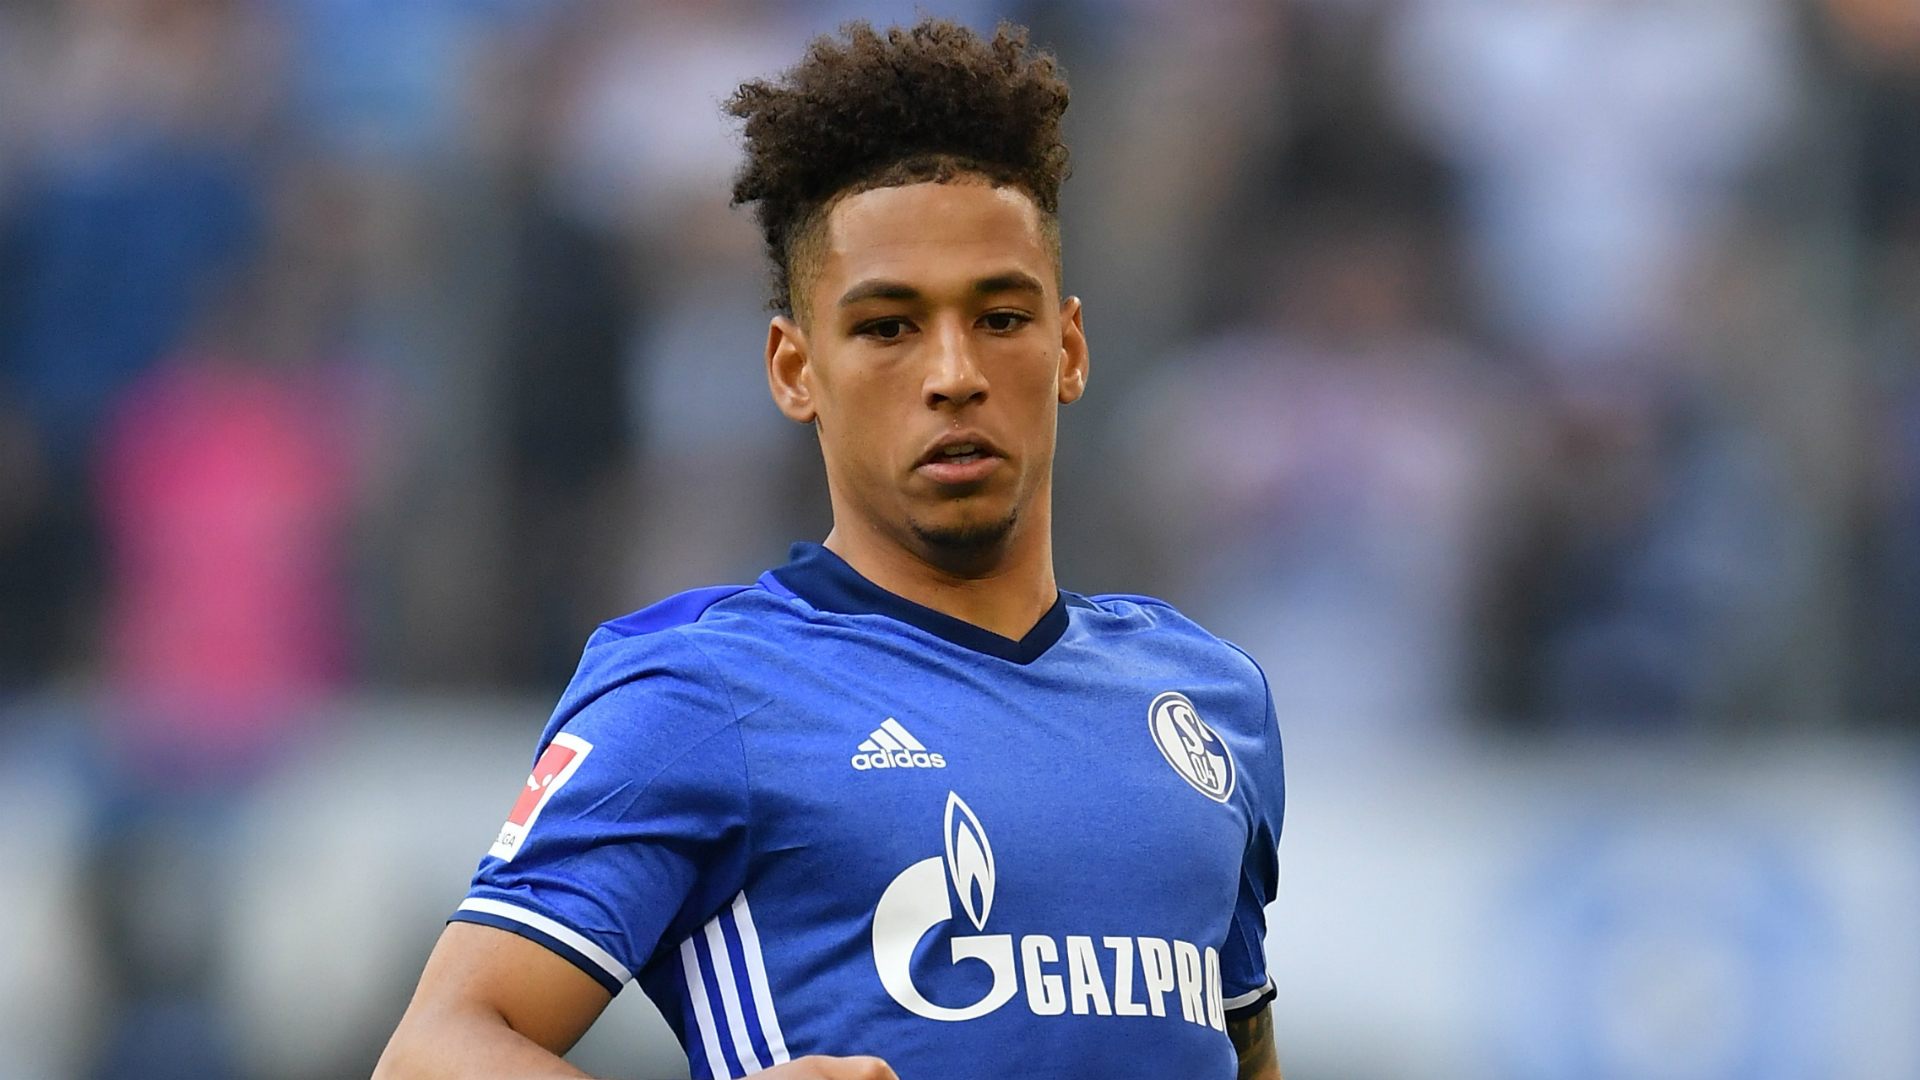 Kehrer To Psg Not Complete Say Schalke Soccer Sporting News